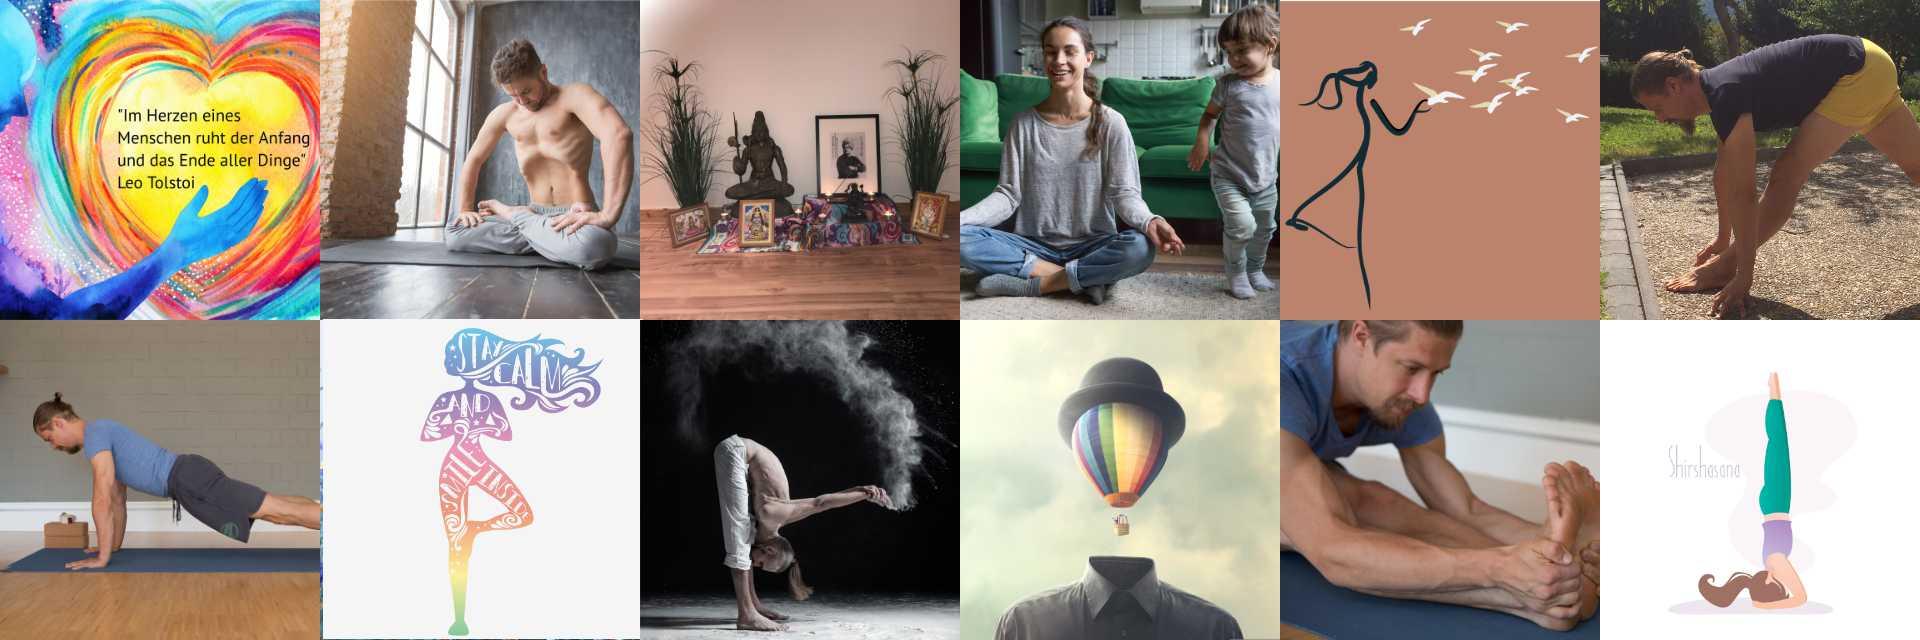 Online-Meditationskurs für den Morgen